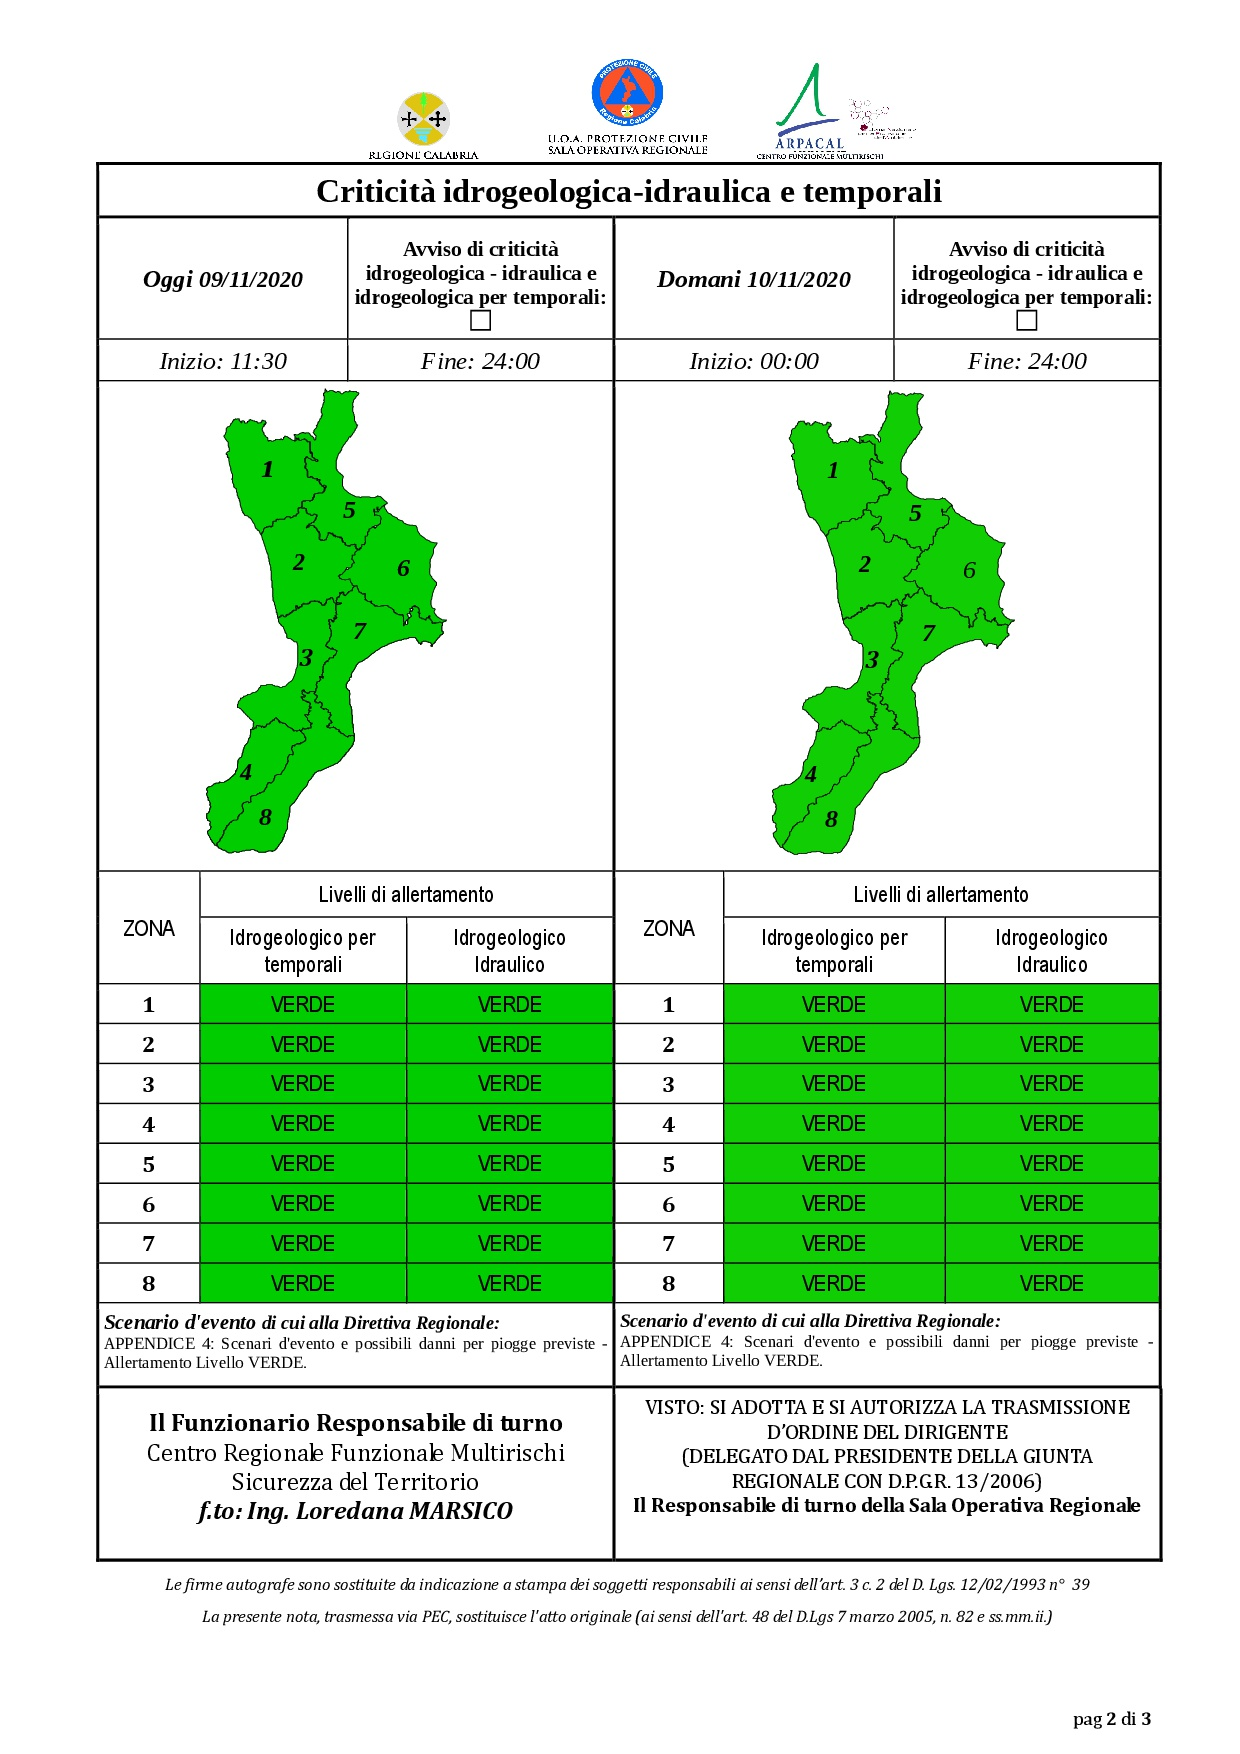 Criticità idrogeologica-idraulica e temporali in Calabria 09-11-2020